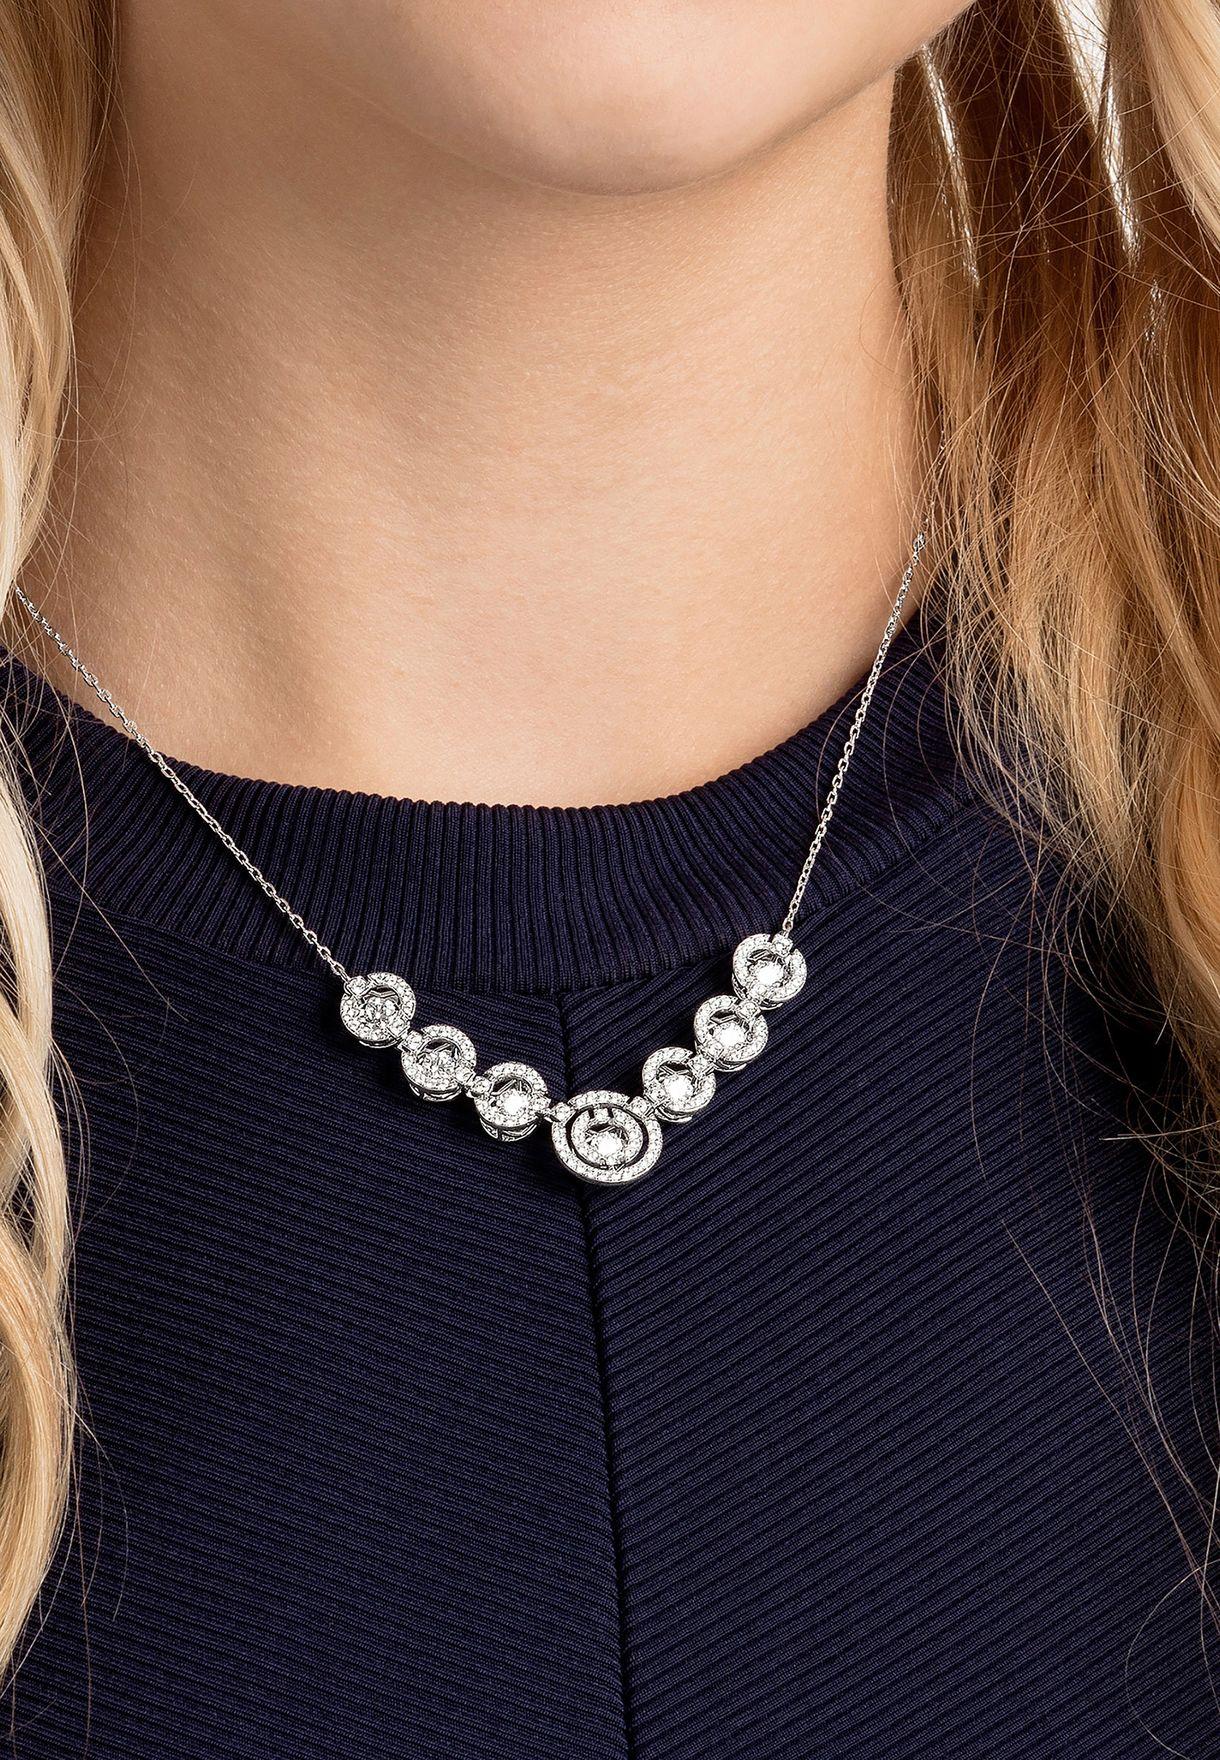 Sparkling Dance Necklace